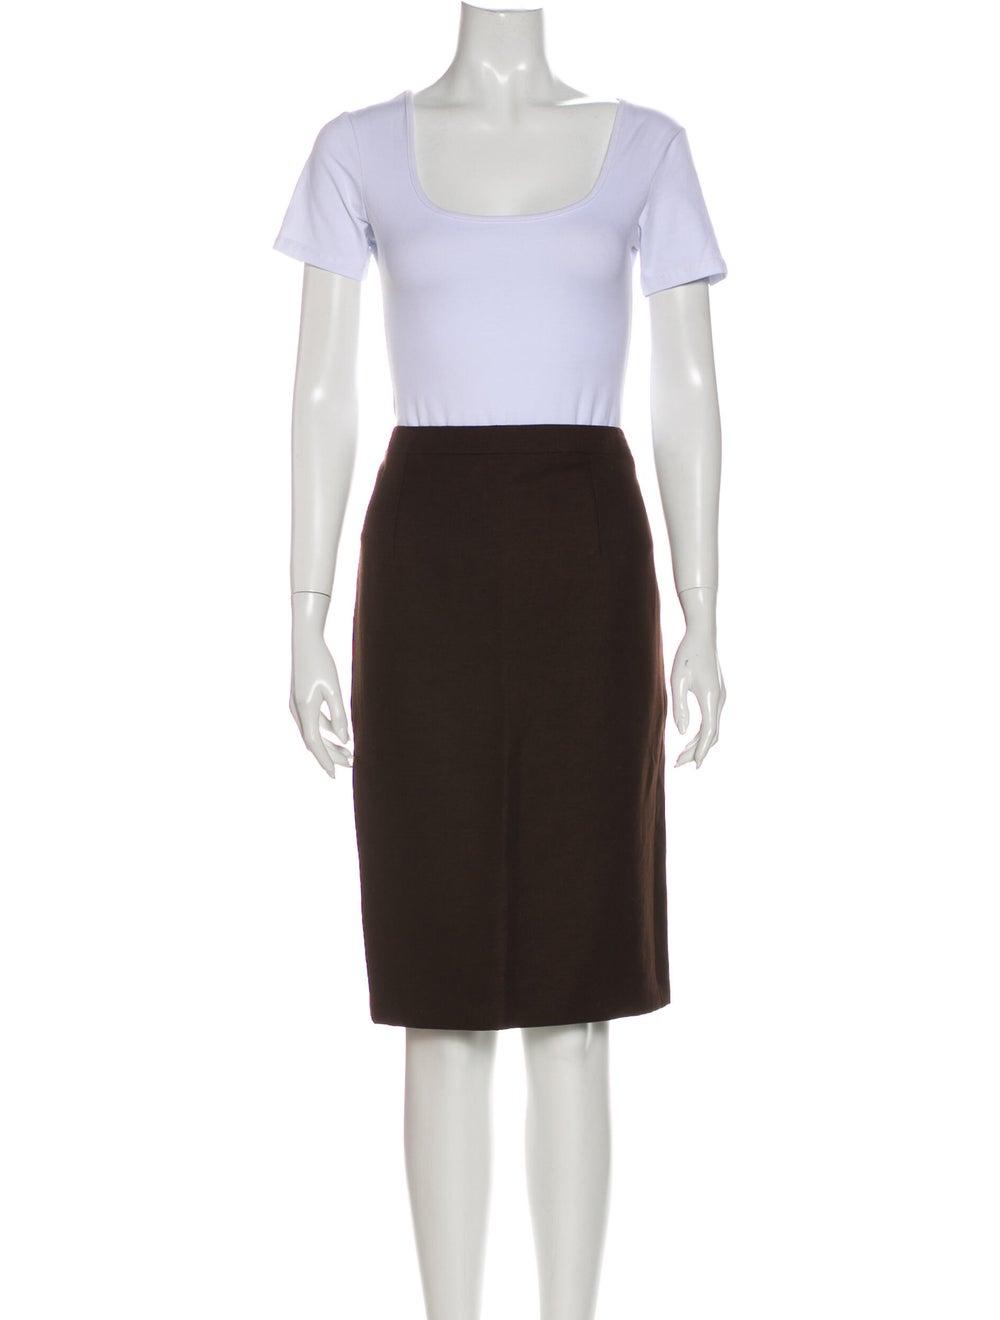 Andrew Gn Linen Skirt Suit Brown - image 4